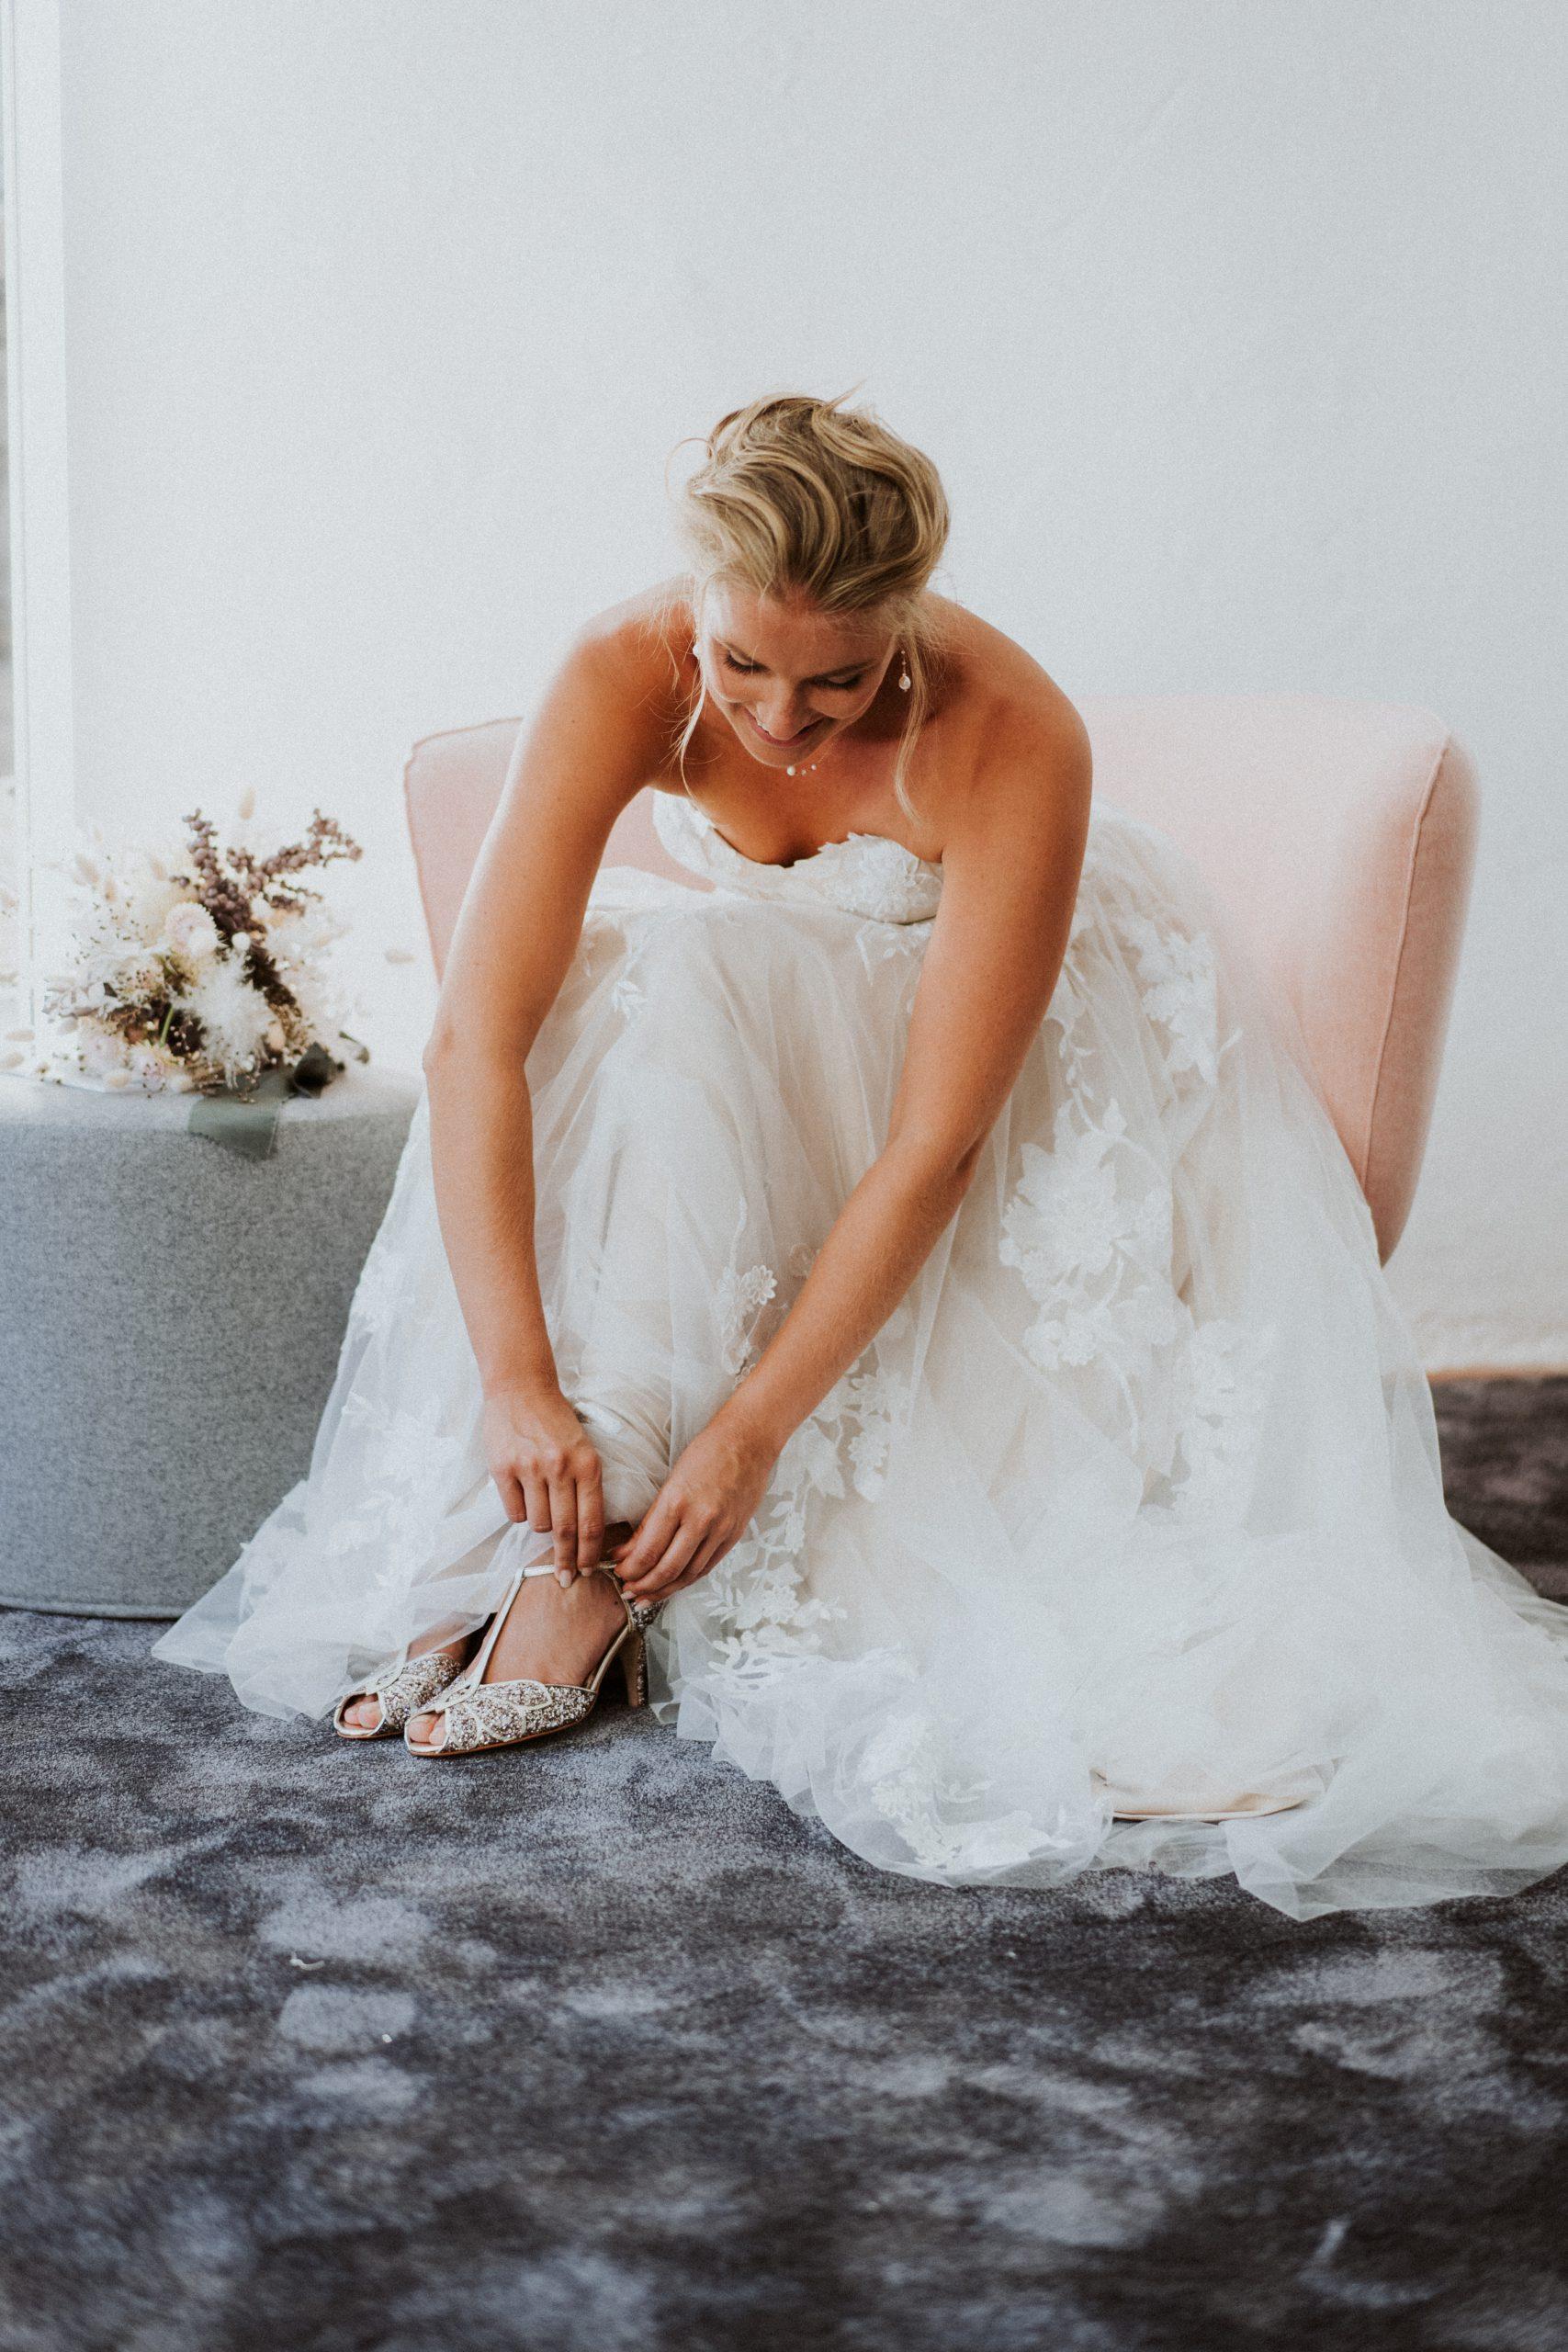 Brautgefluster | Fotocredit: Henry_Welisch_Photography